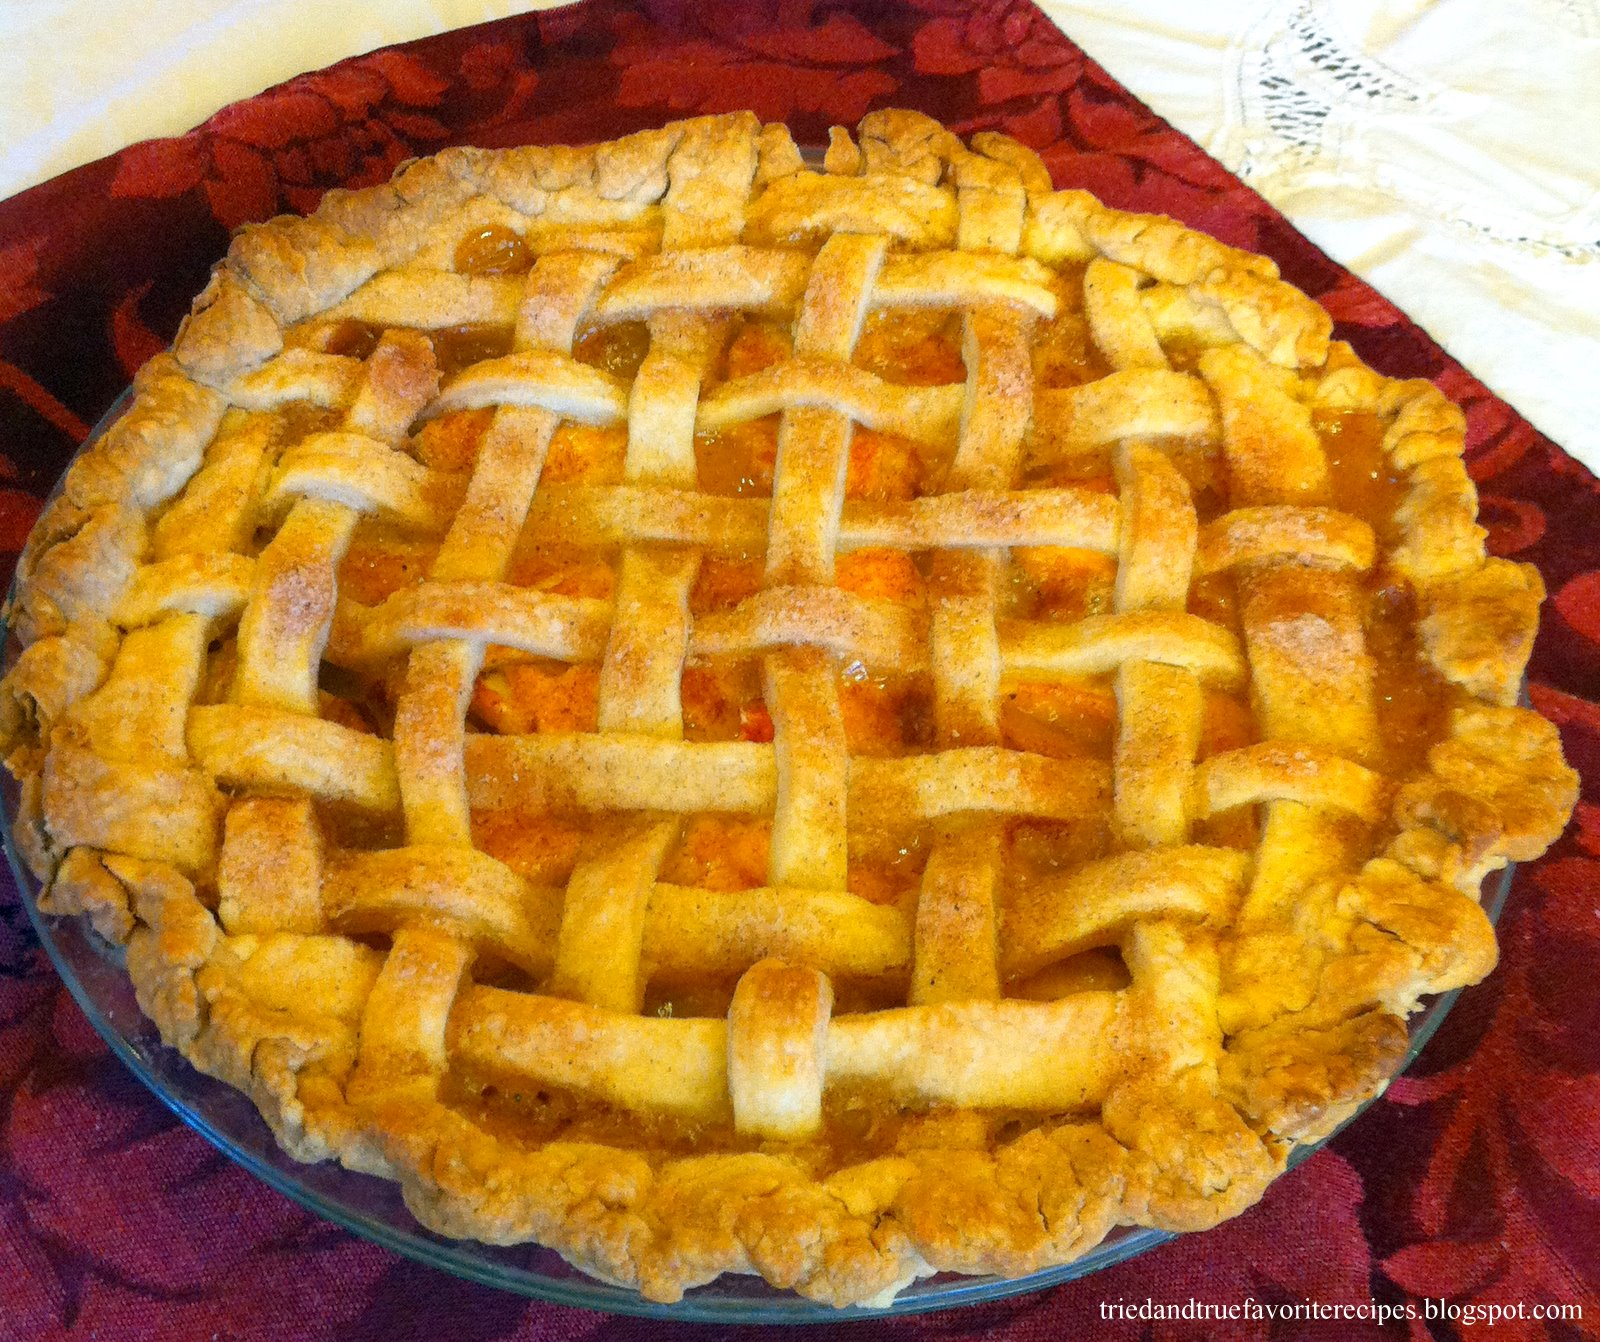 Tried and True Favorite Recipes: Peach Pie with lattice top crust